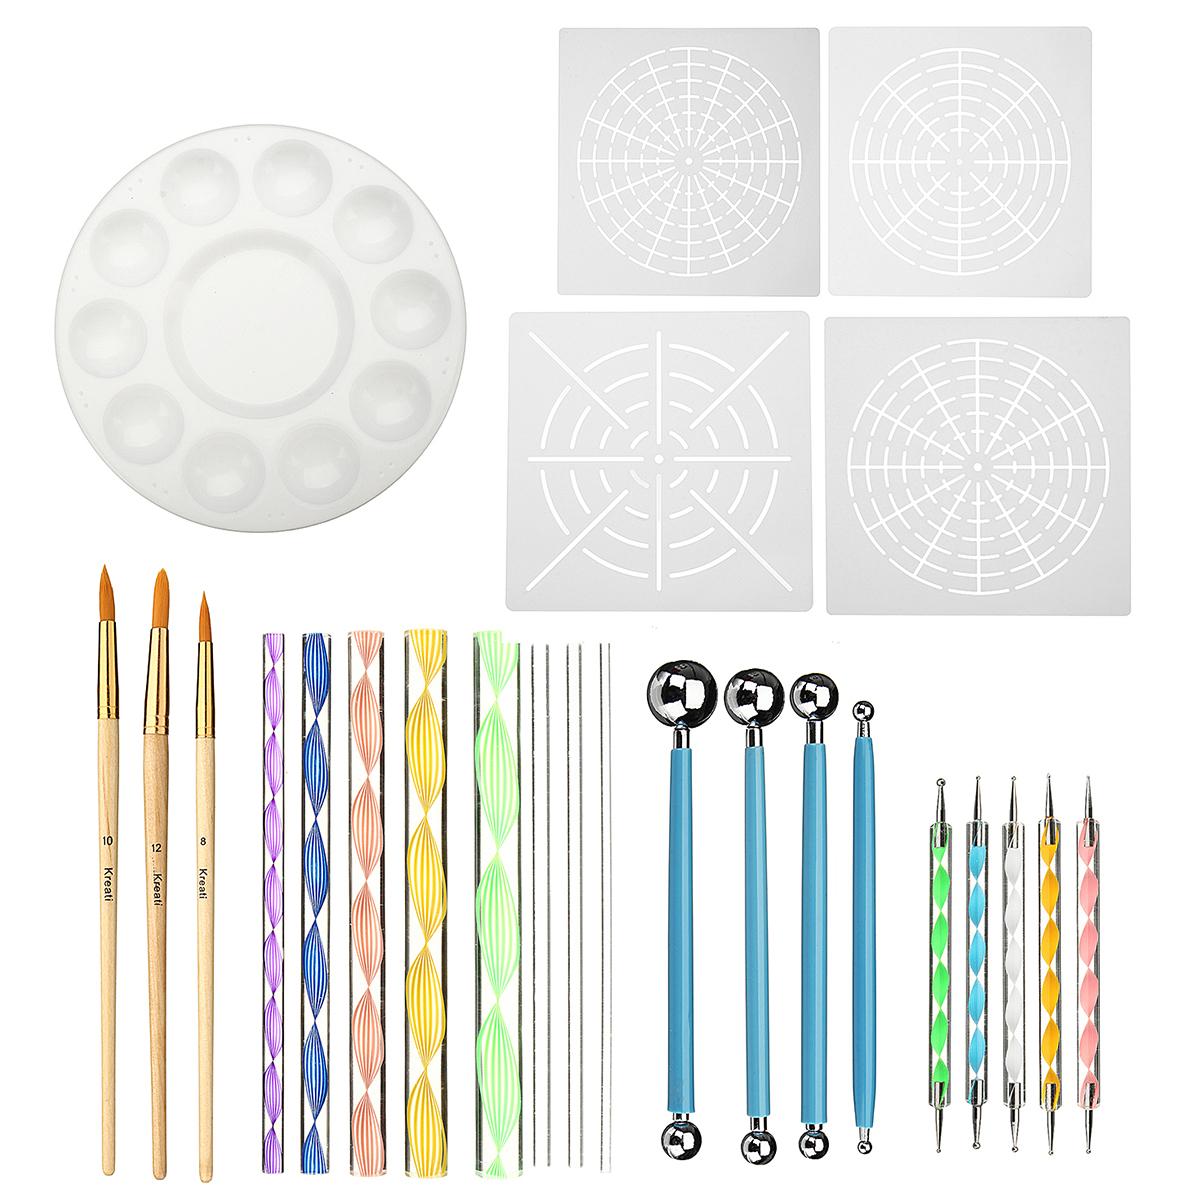 25Pcs/Set Mandala Dotting Set Diamond Paintings Tool Drawing Kits Brushes and Paint Tray for Kids Crafts Nail Art Painting